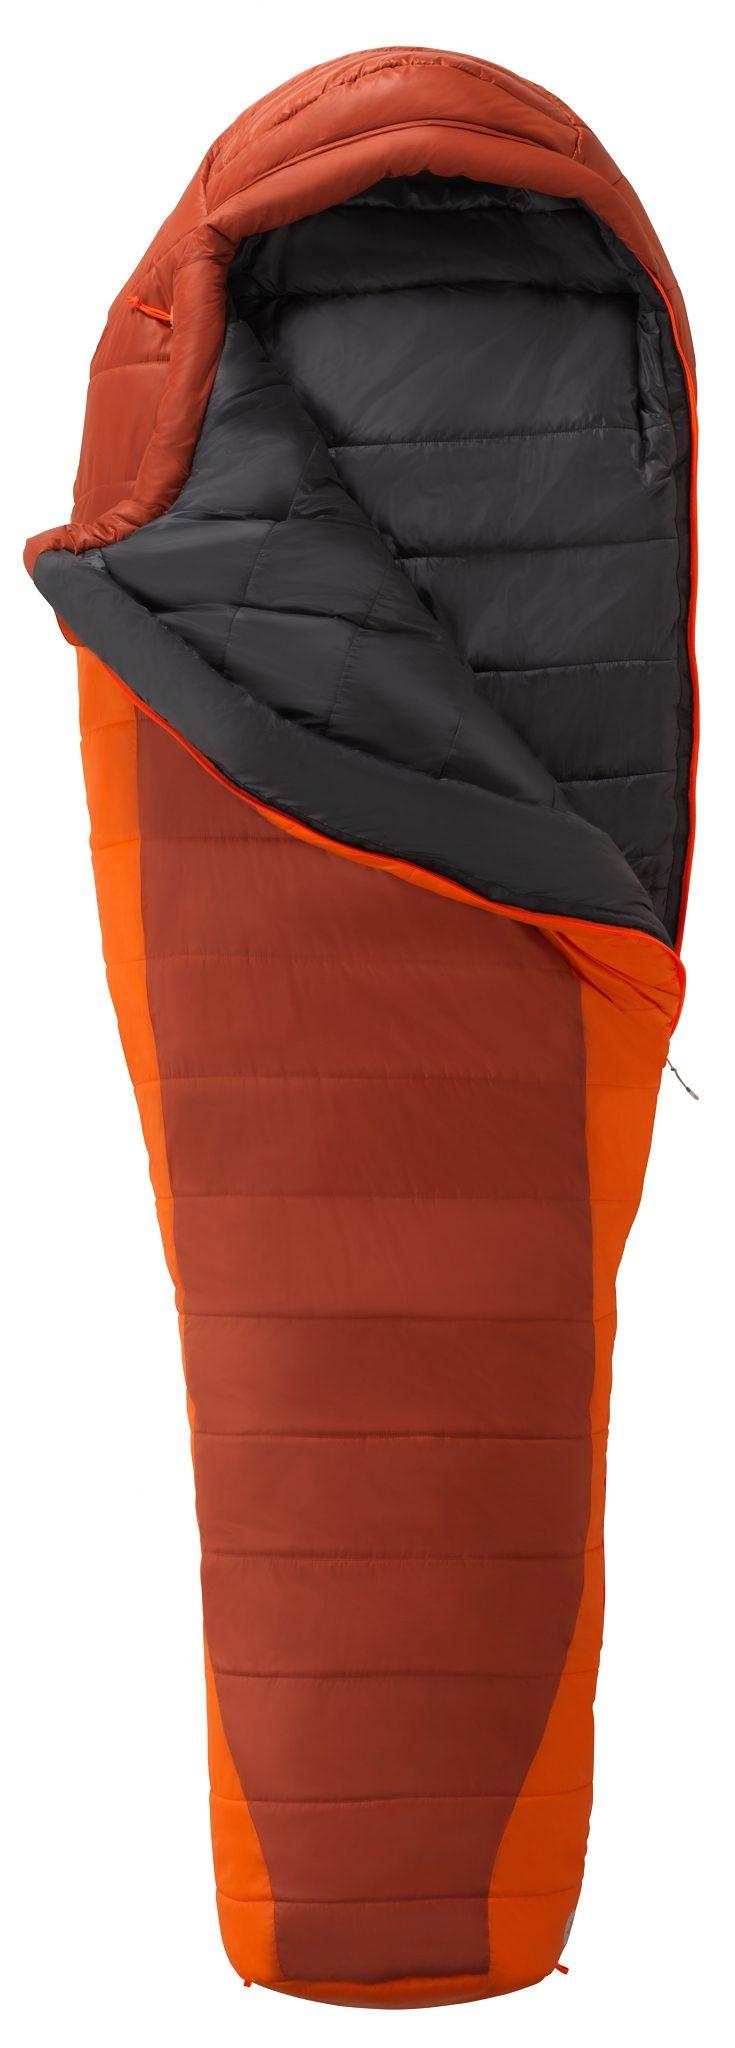 Marmot Schlafsack »Cloudbreak 0 Sleeping Bag Regular«